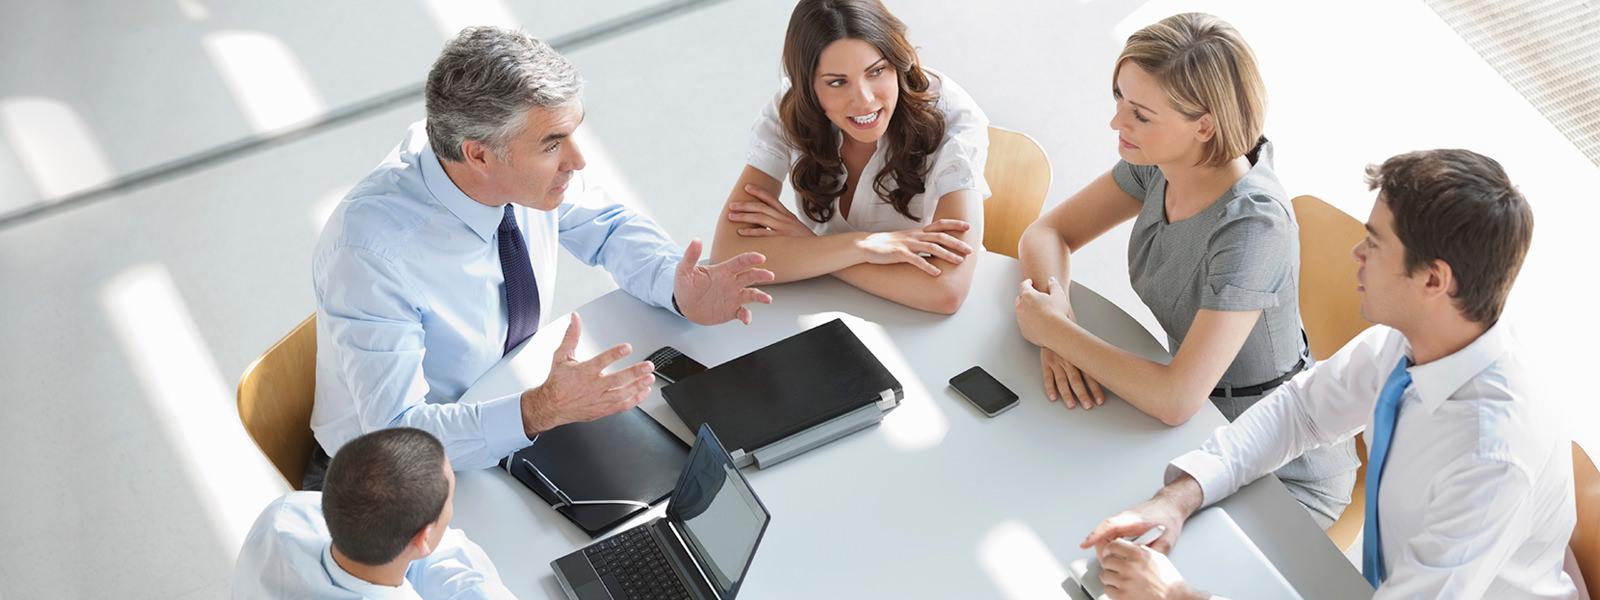 Training Peran Human Capital Dalam Membangun Budaya Pelayanan